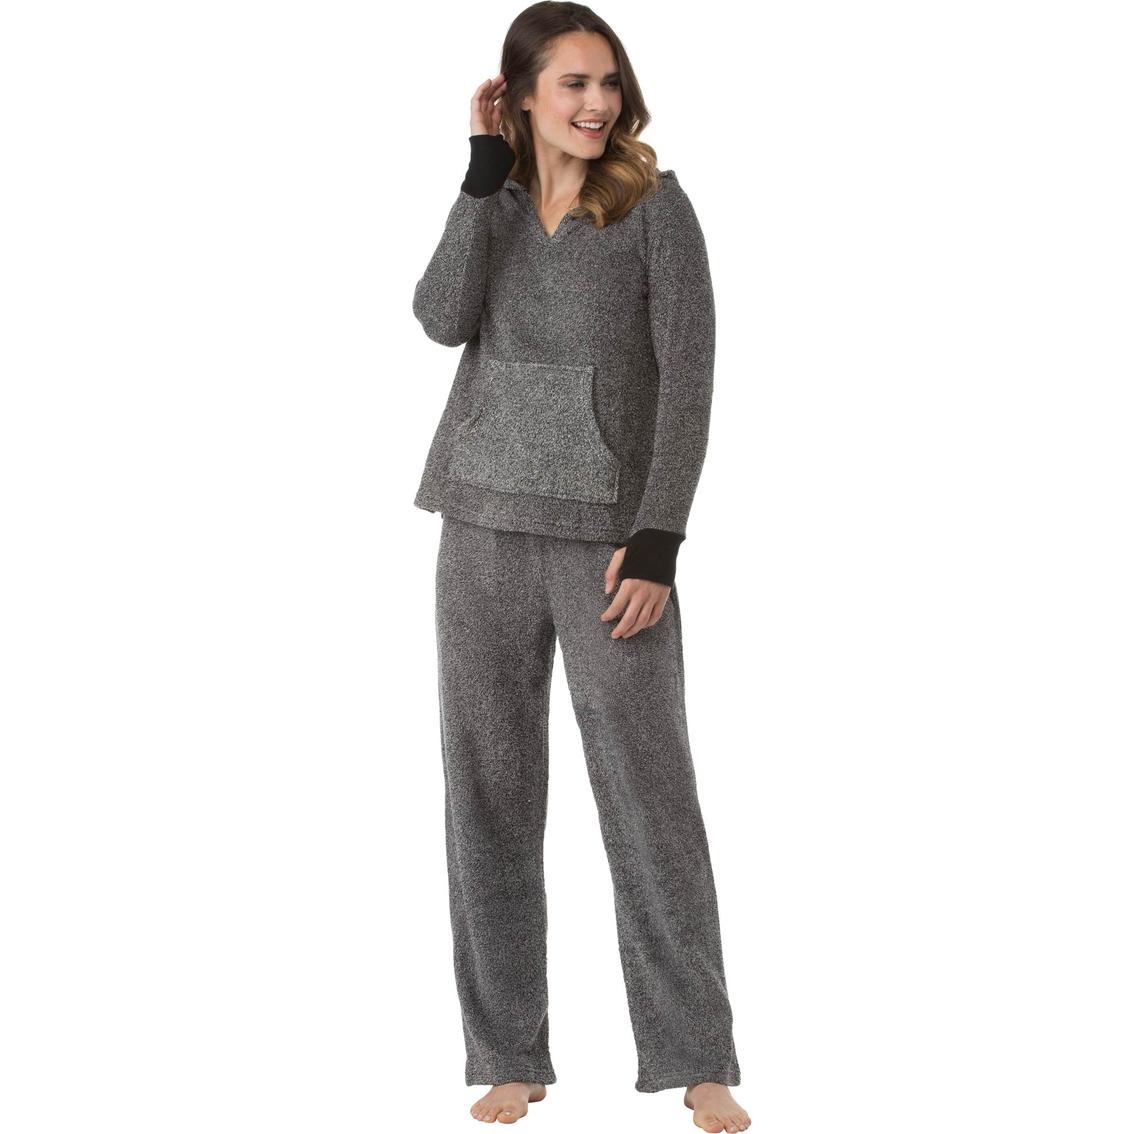 027e097ff2 Rene Rofe Gnarly Marly Pajama Set